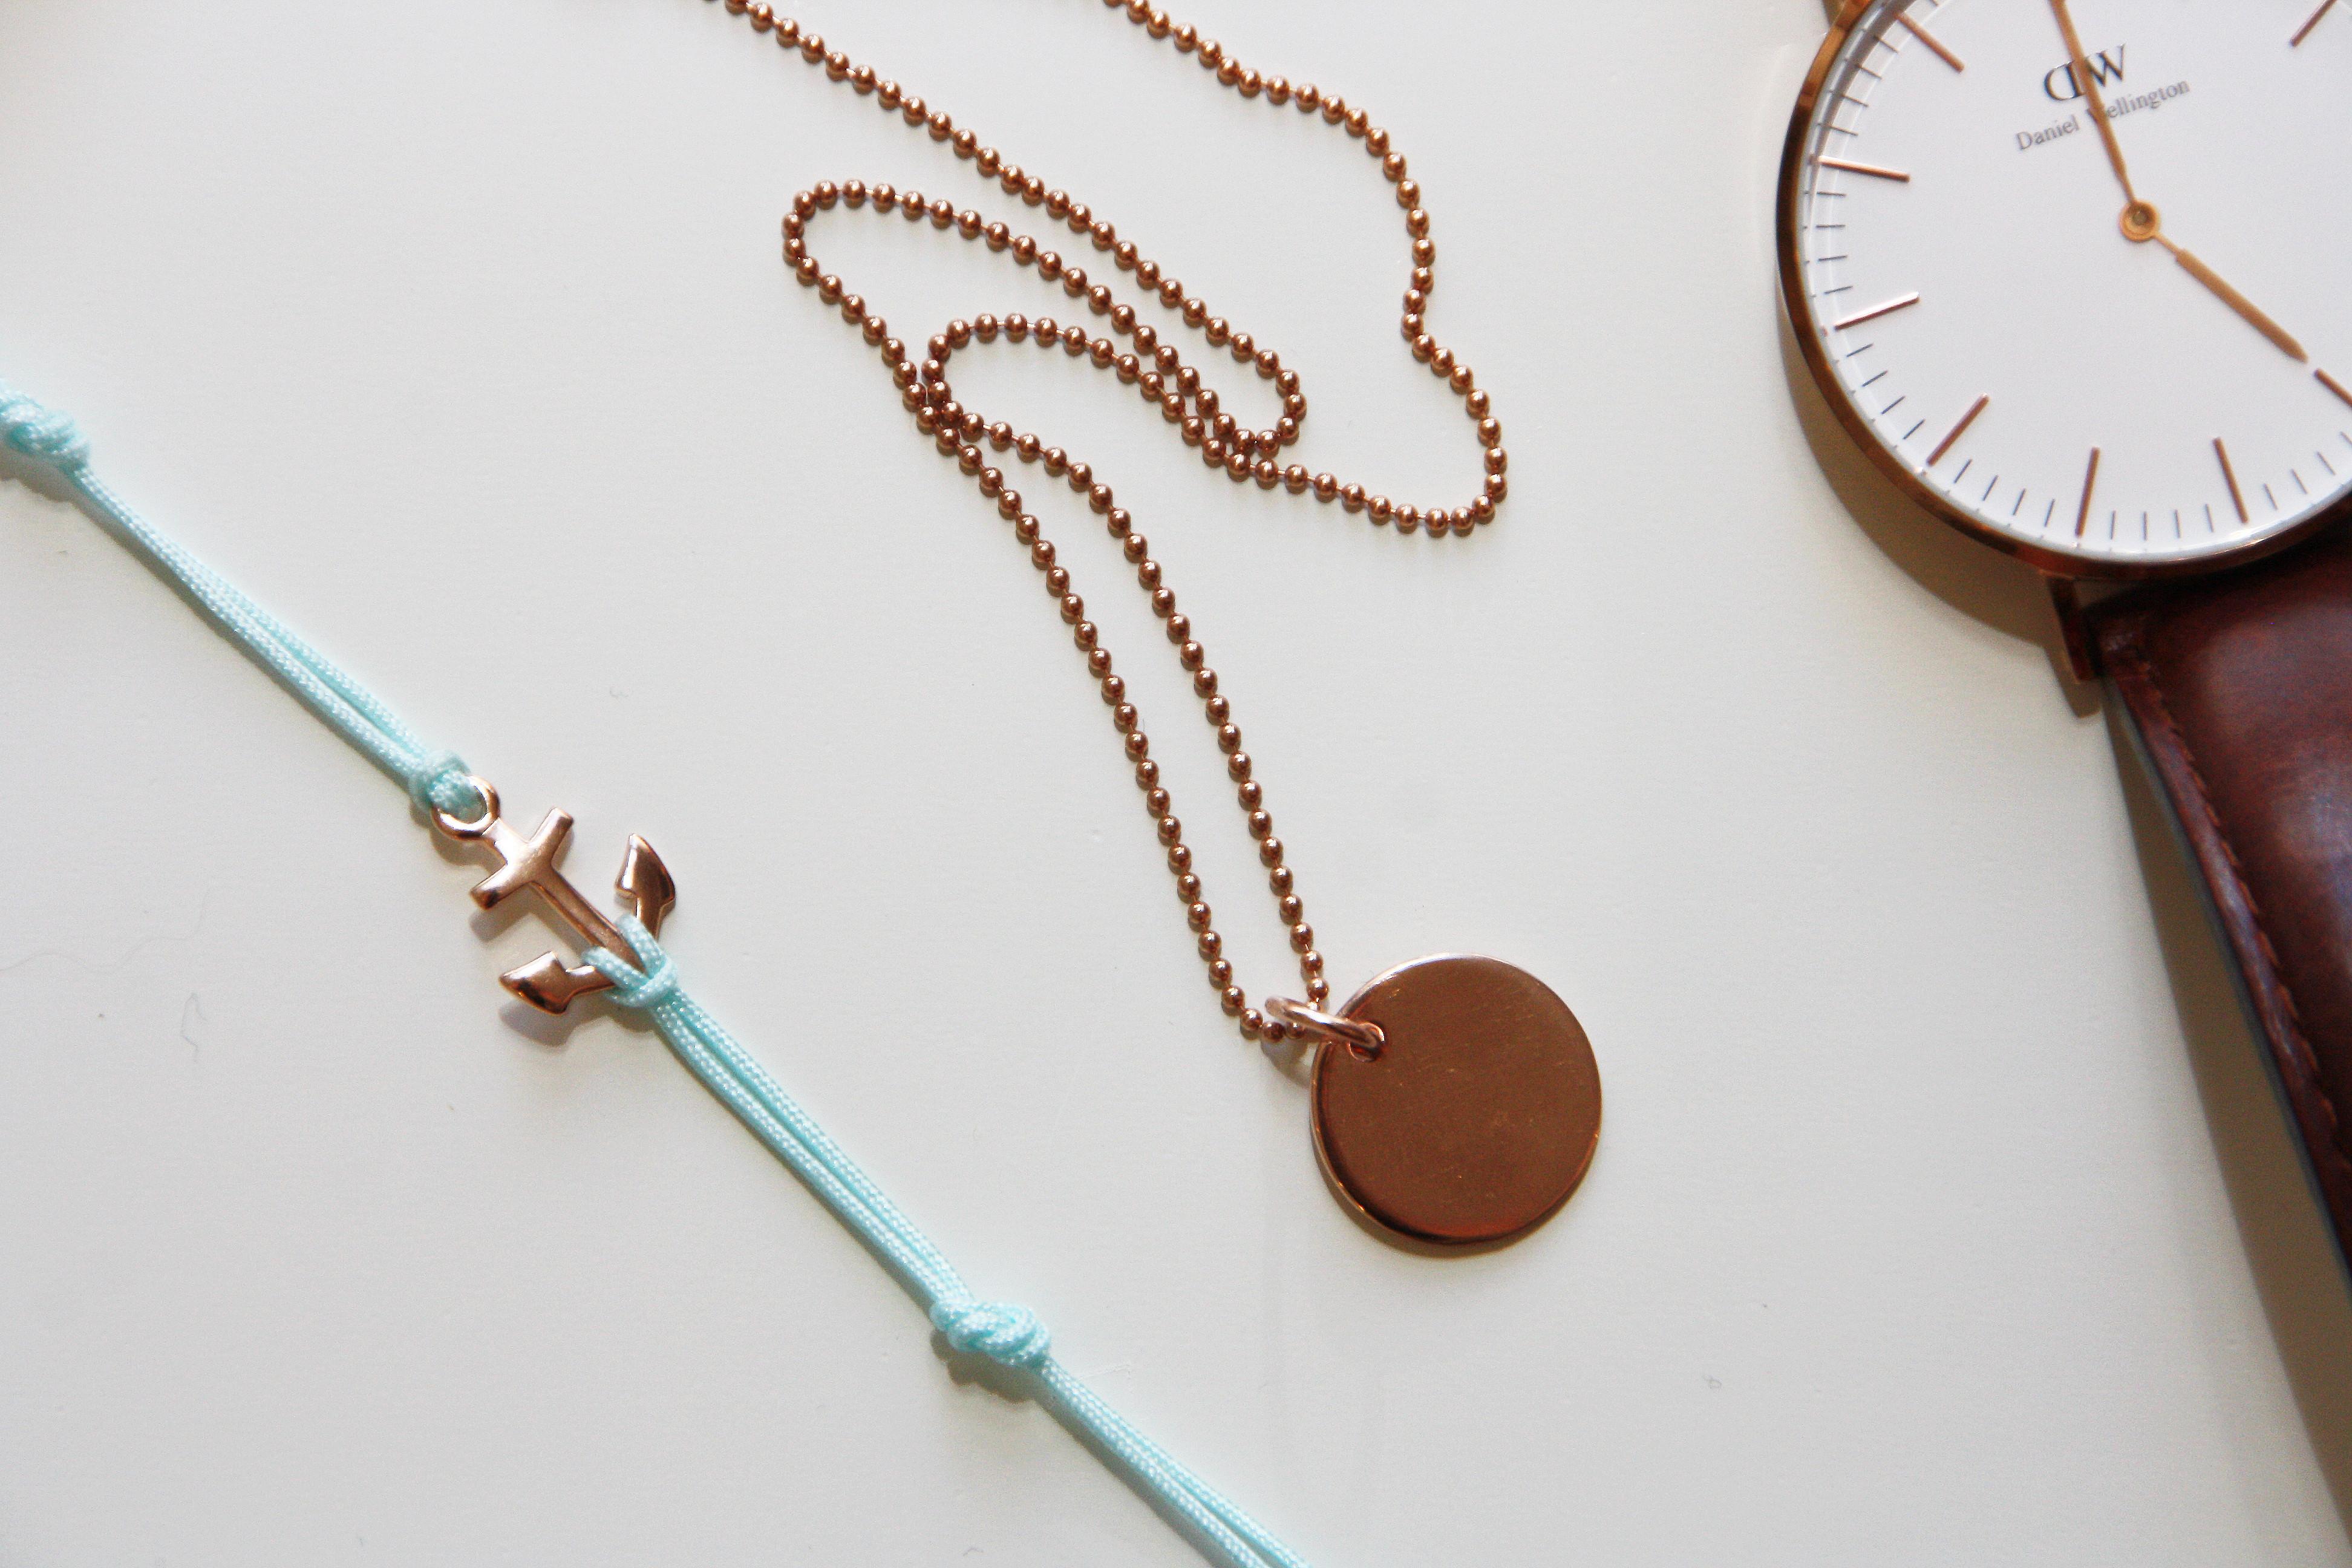 Armband Verschluss Diy  Rosegoldene Kette mit passendem Anker Armband